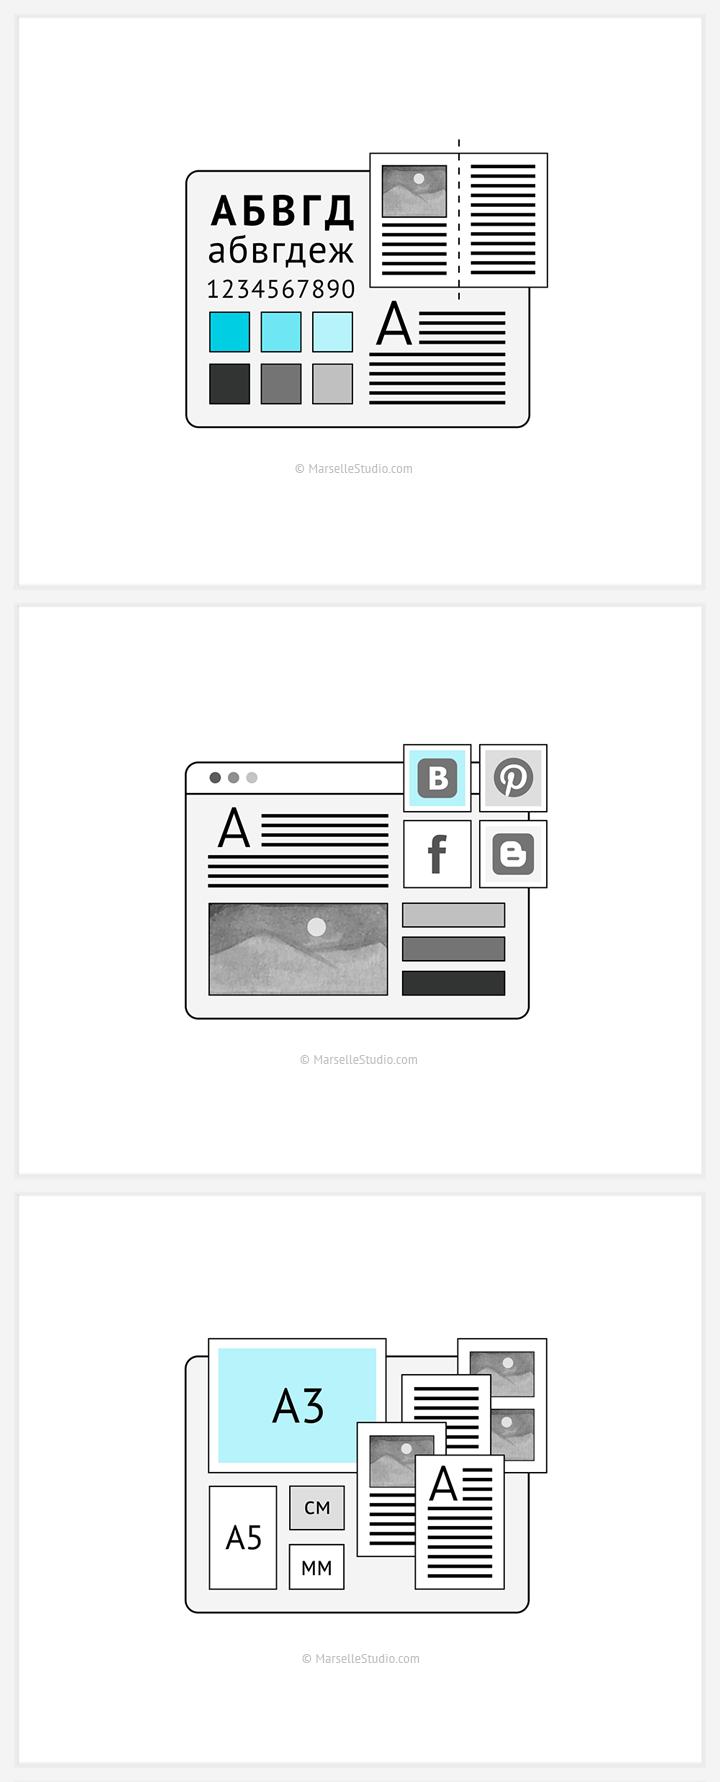 marsellestudio_icons